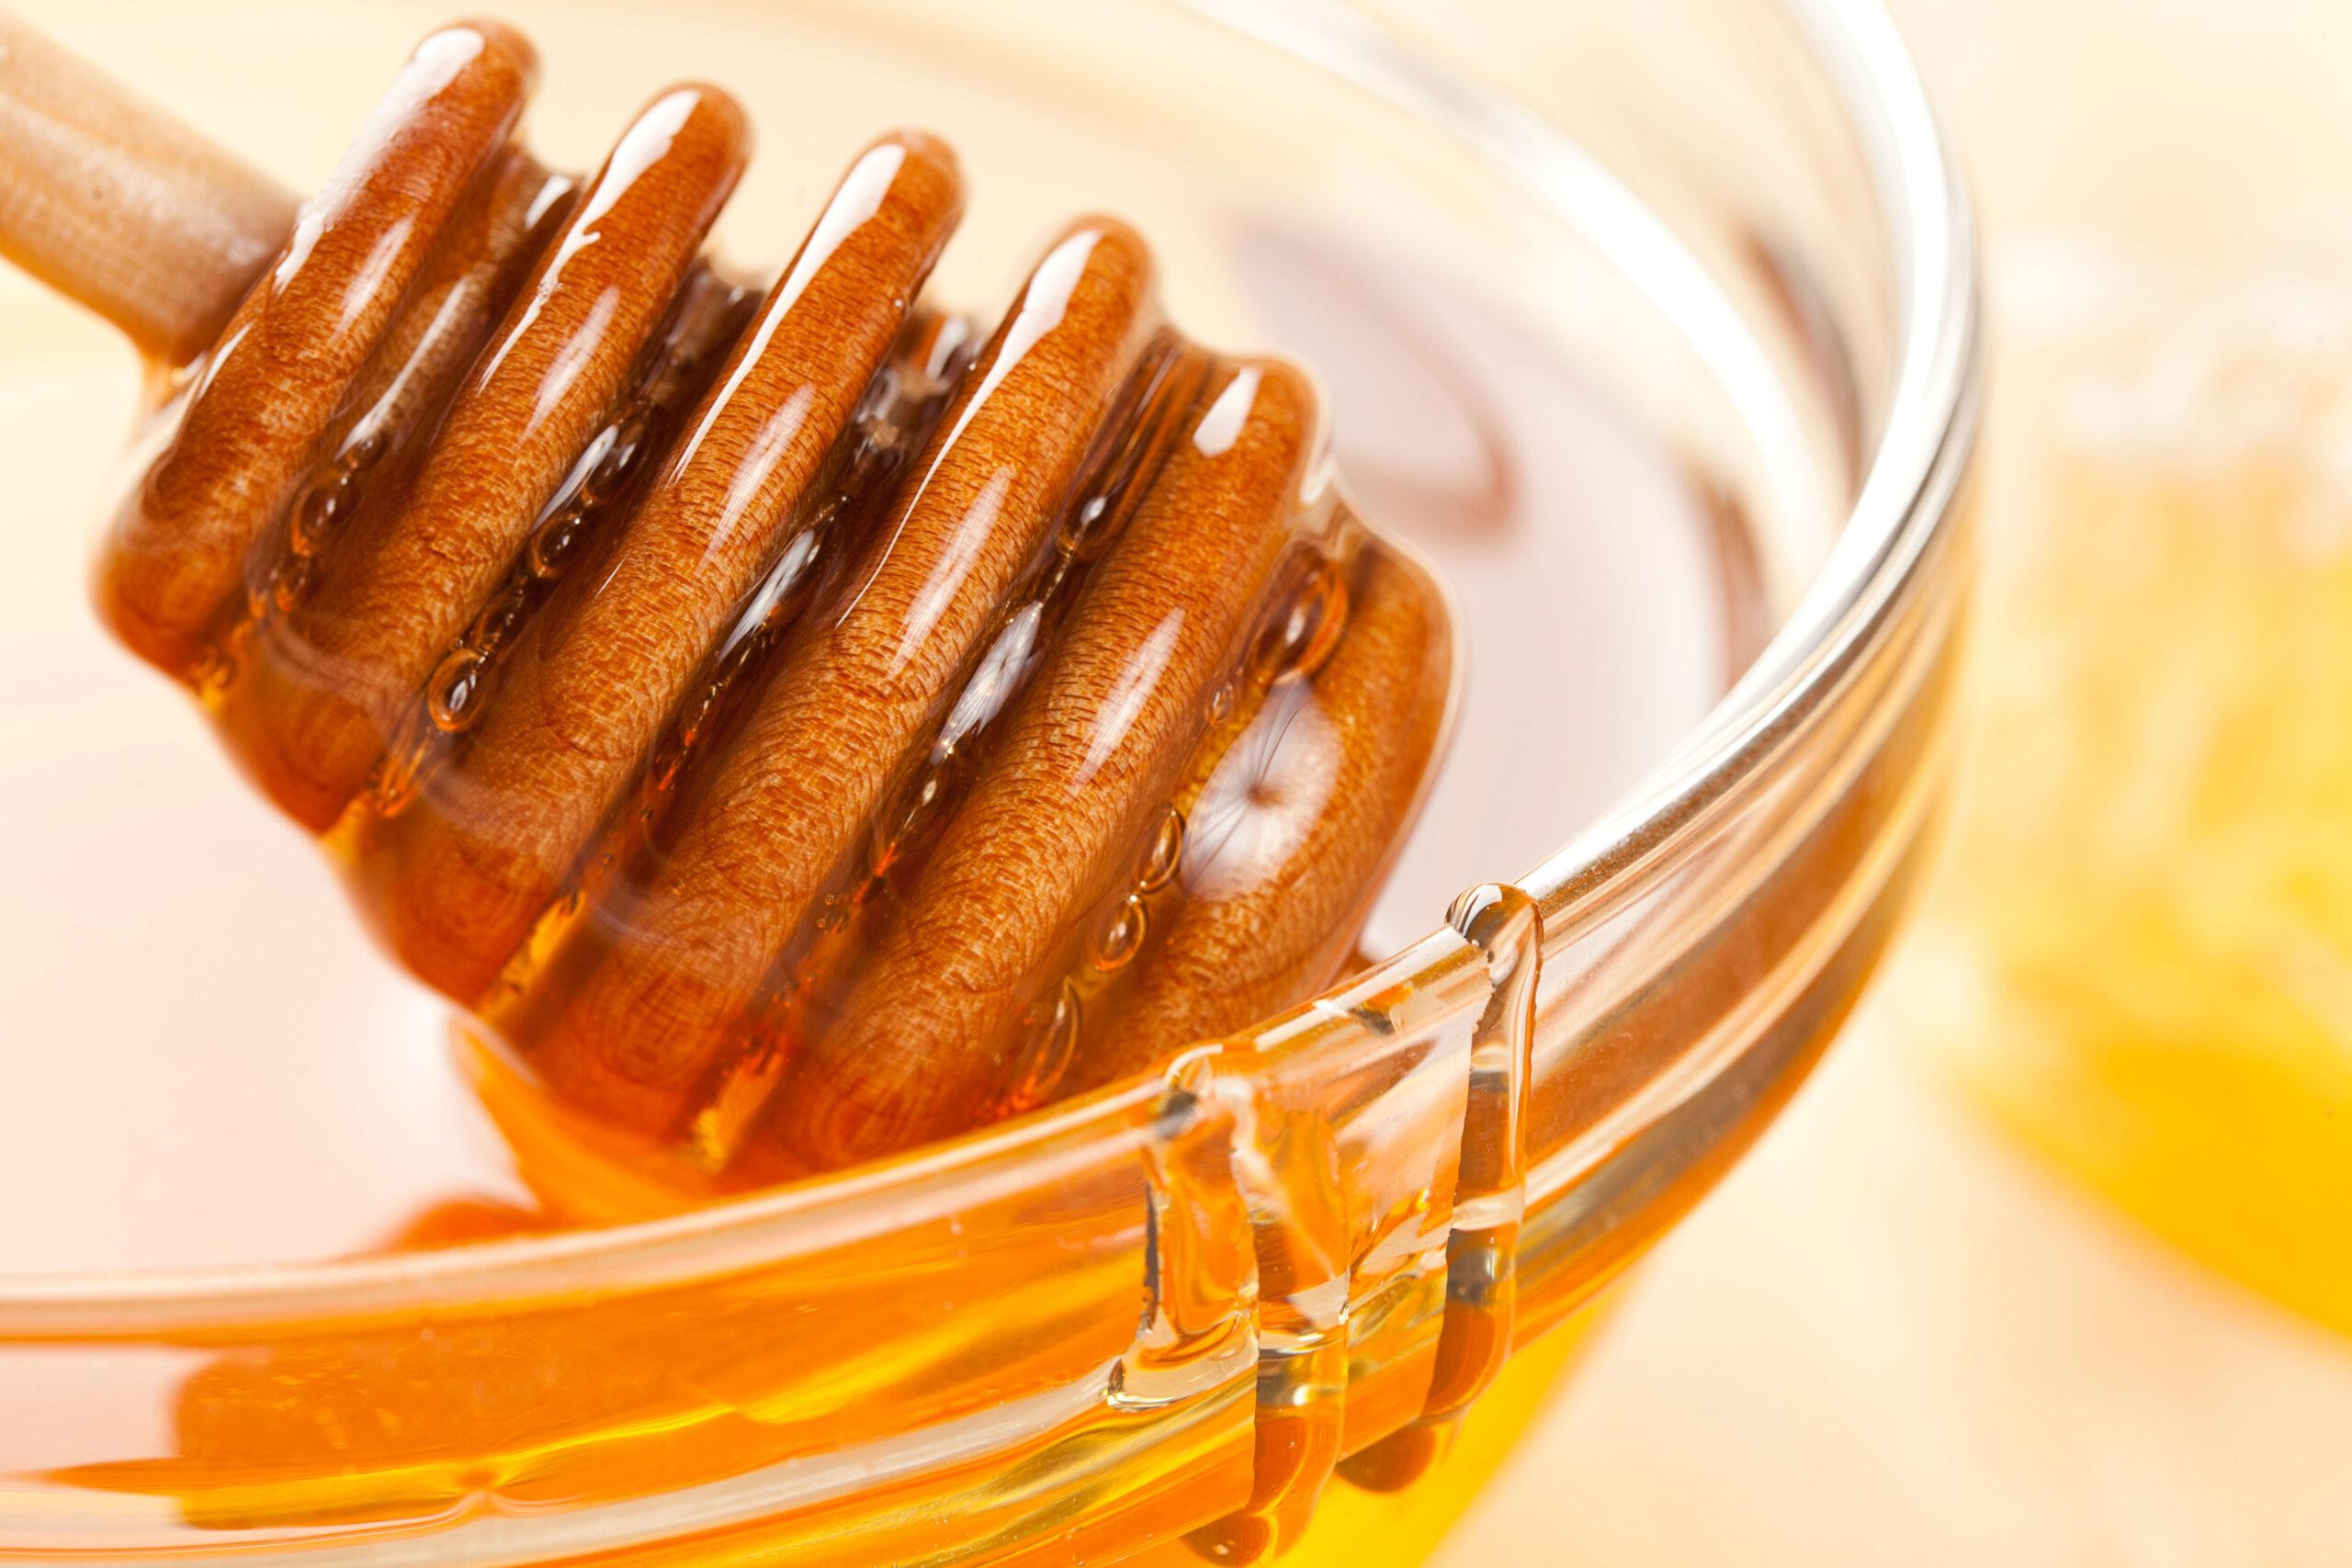 Honey hallucinations